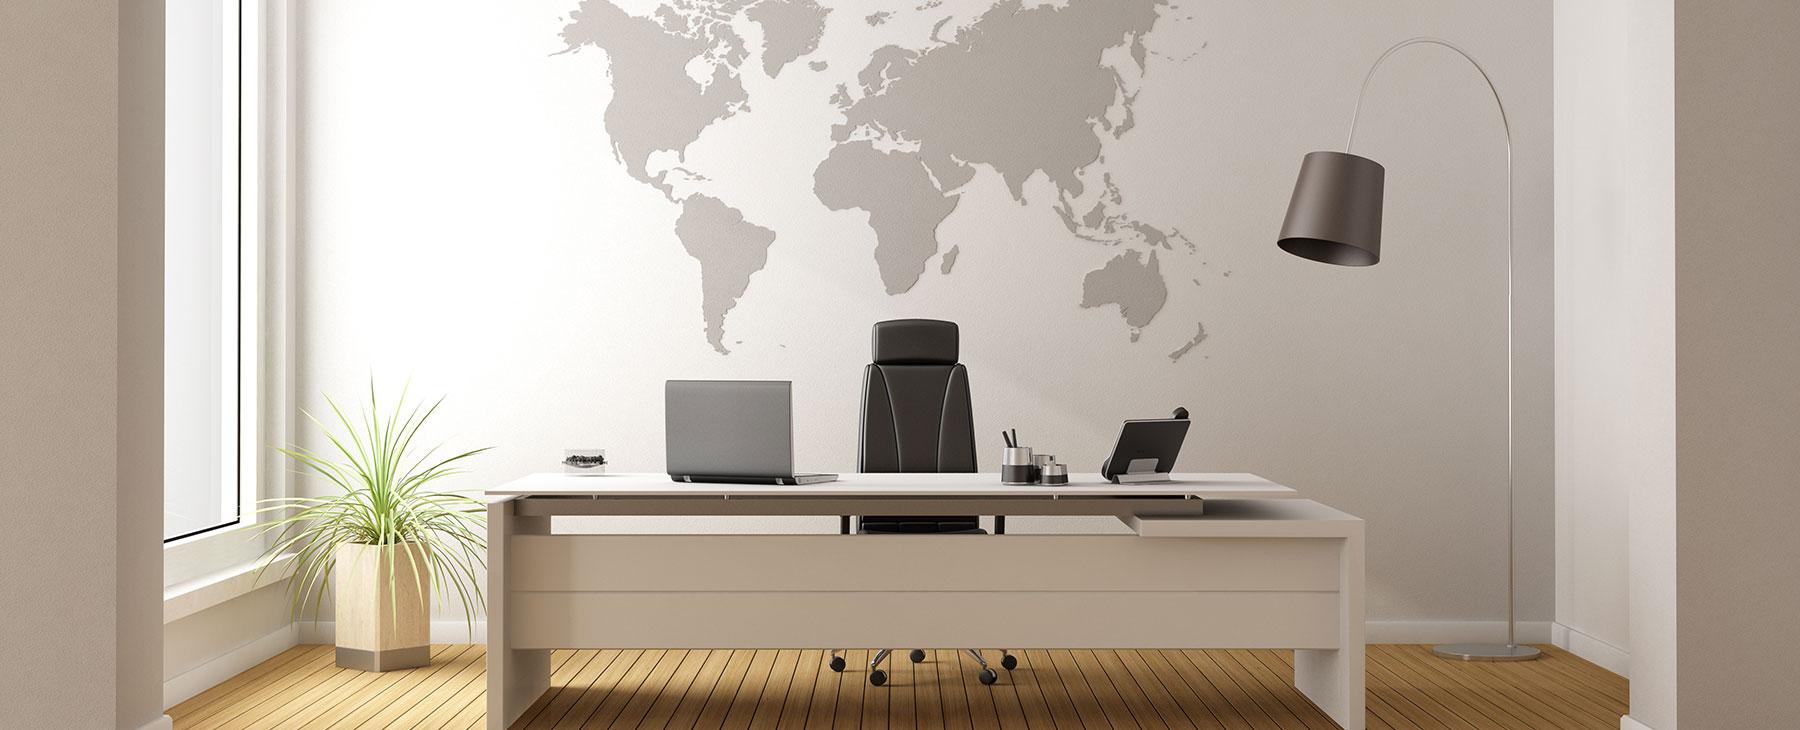 Sai Office - Office Furniture